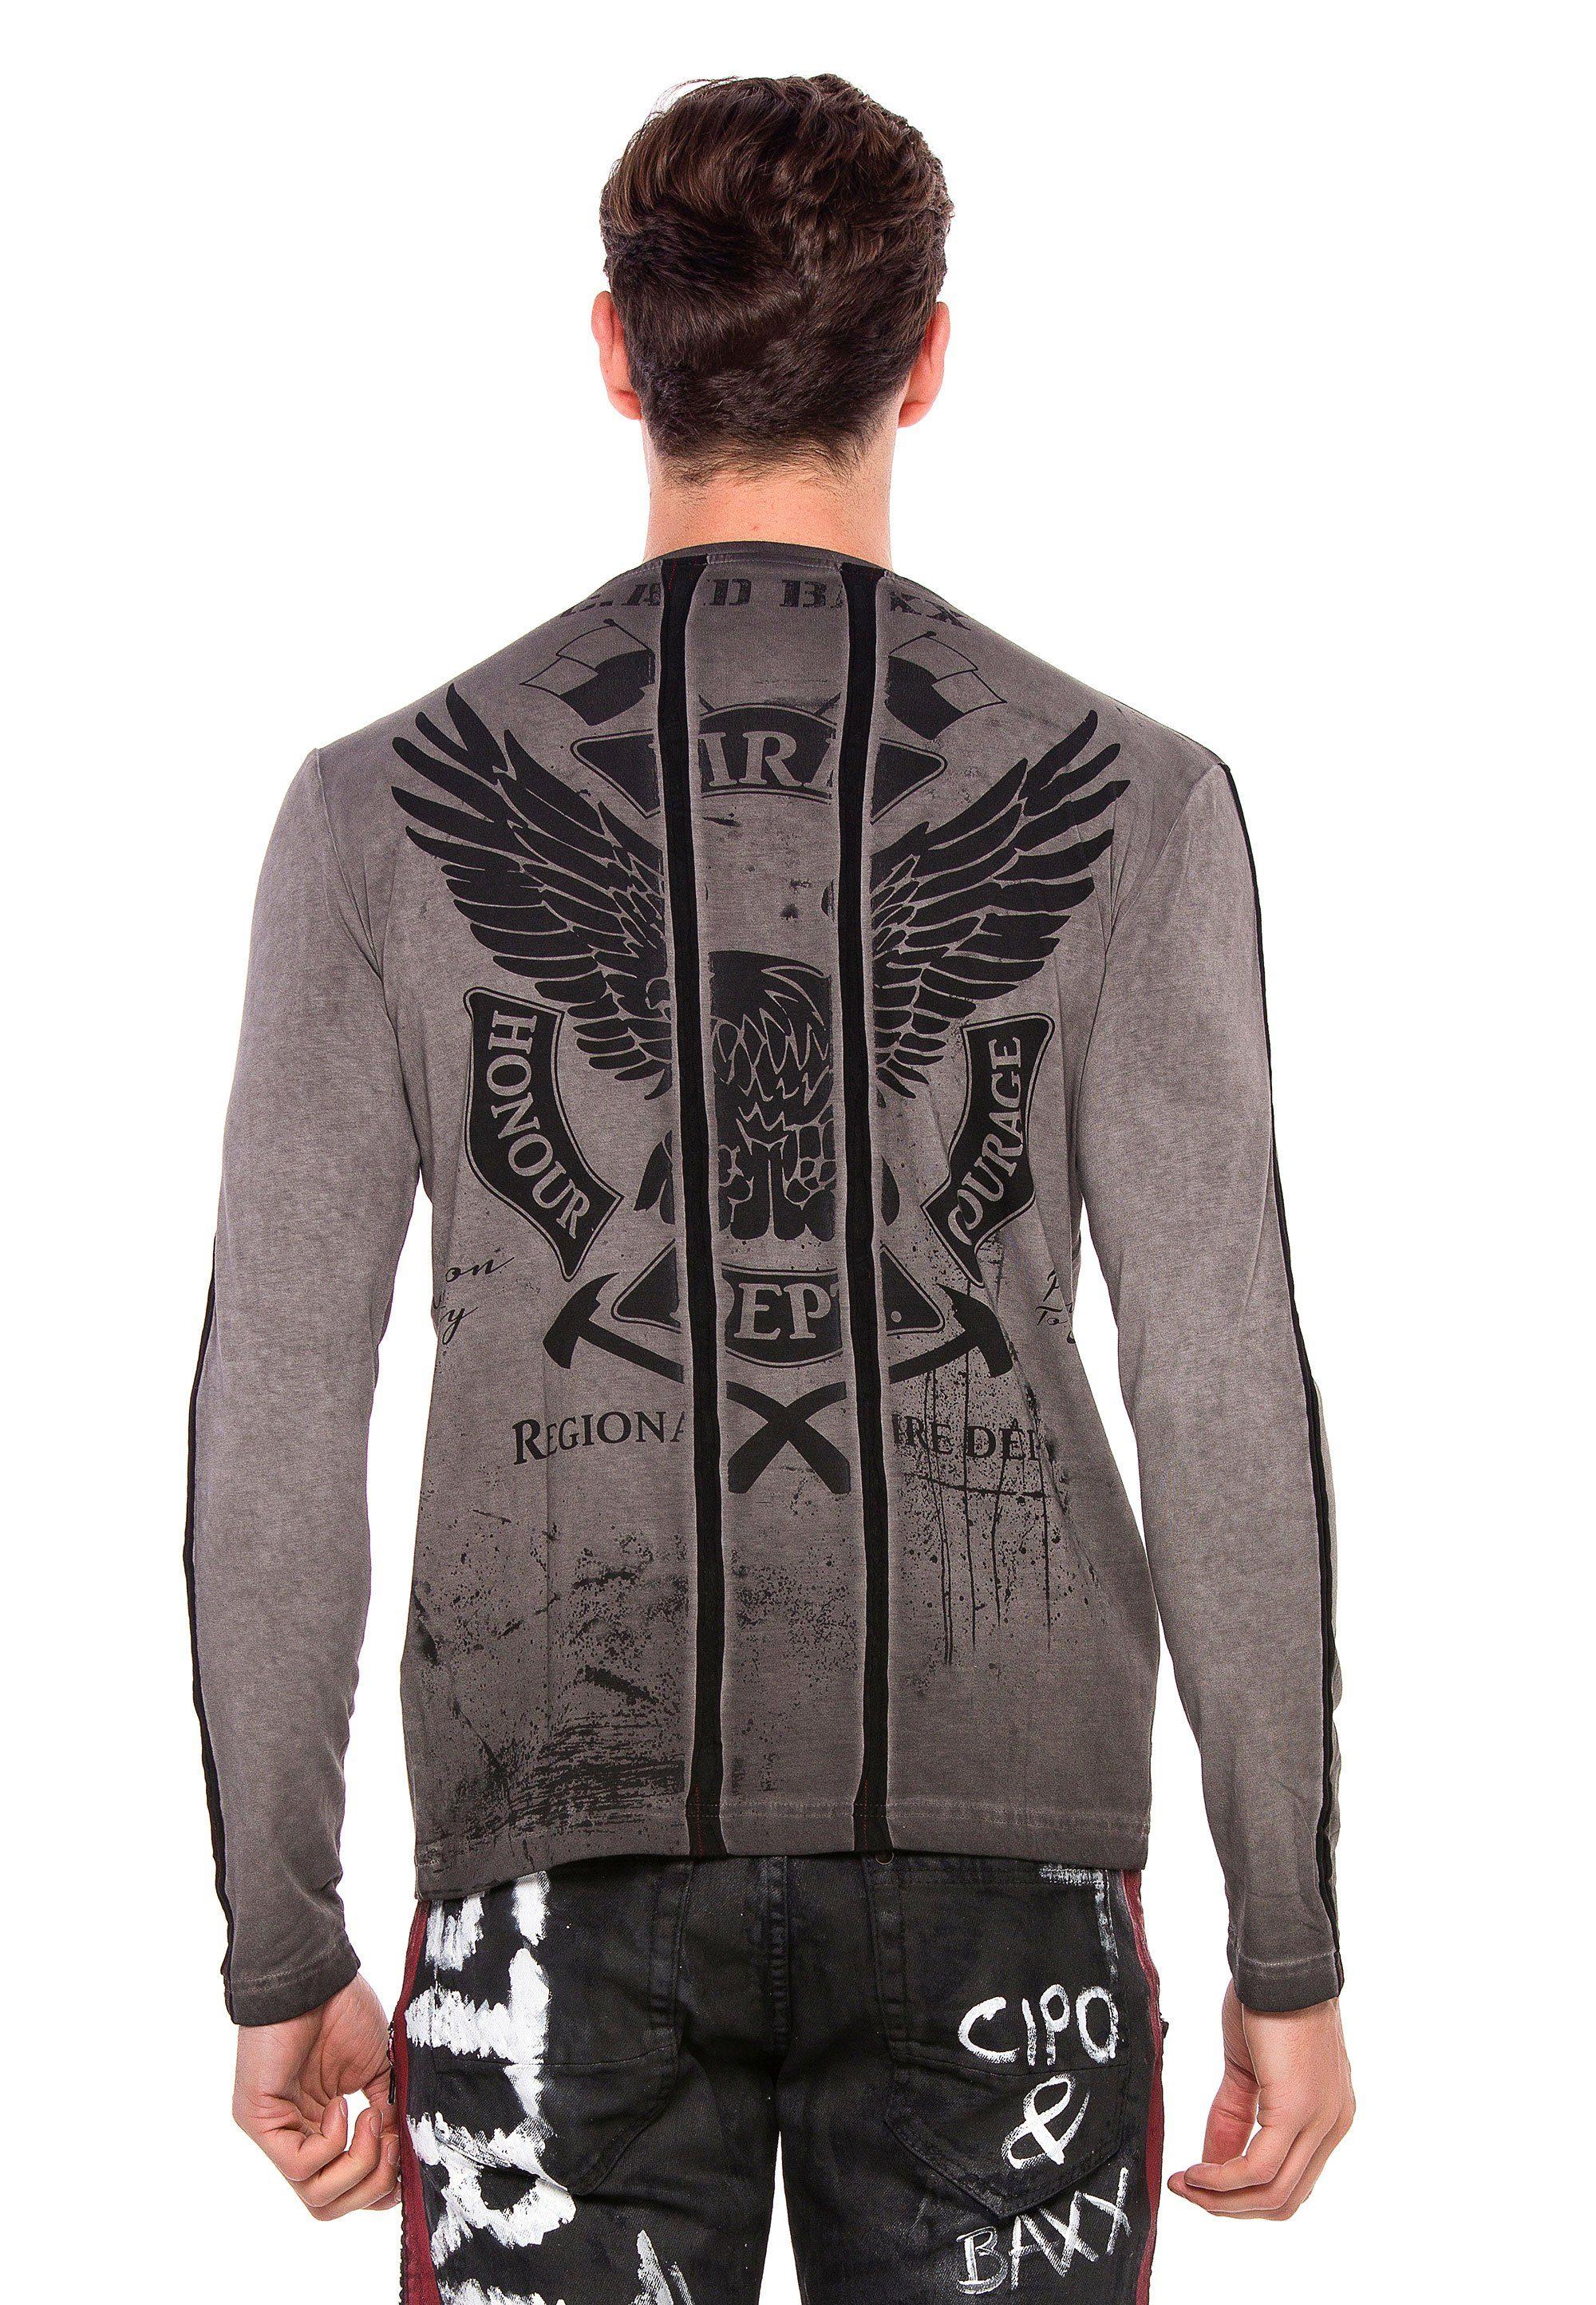 Cipo & Baxx Sweatshirt Ride Or Die im Antique Look